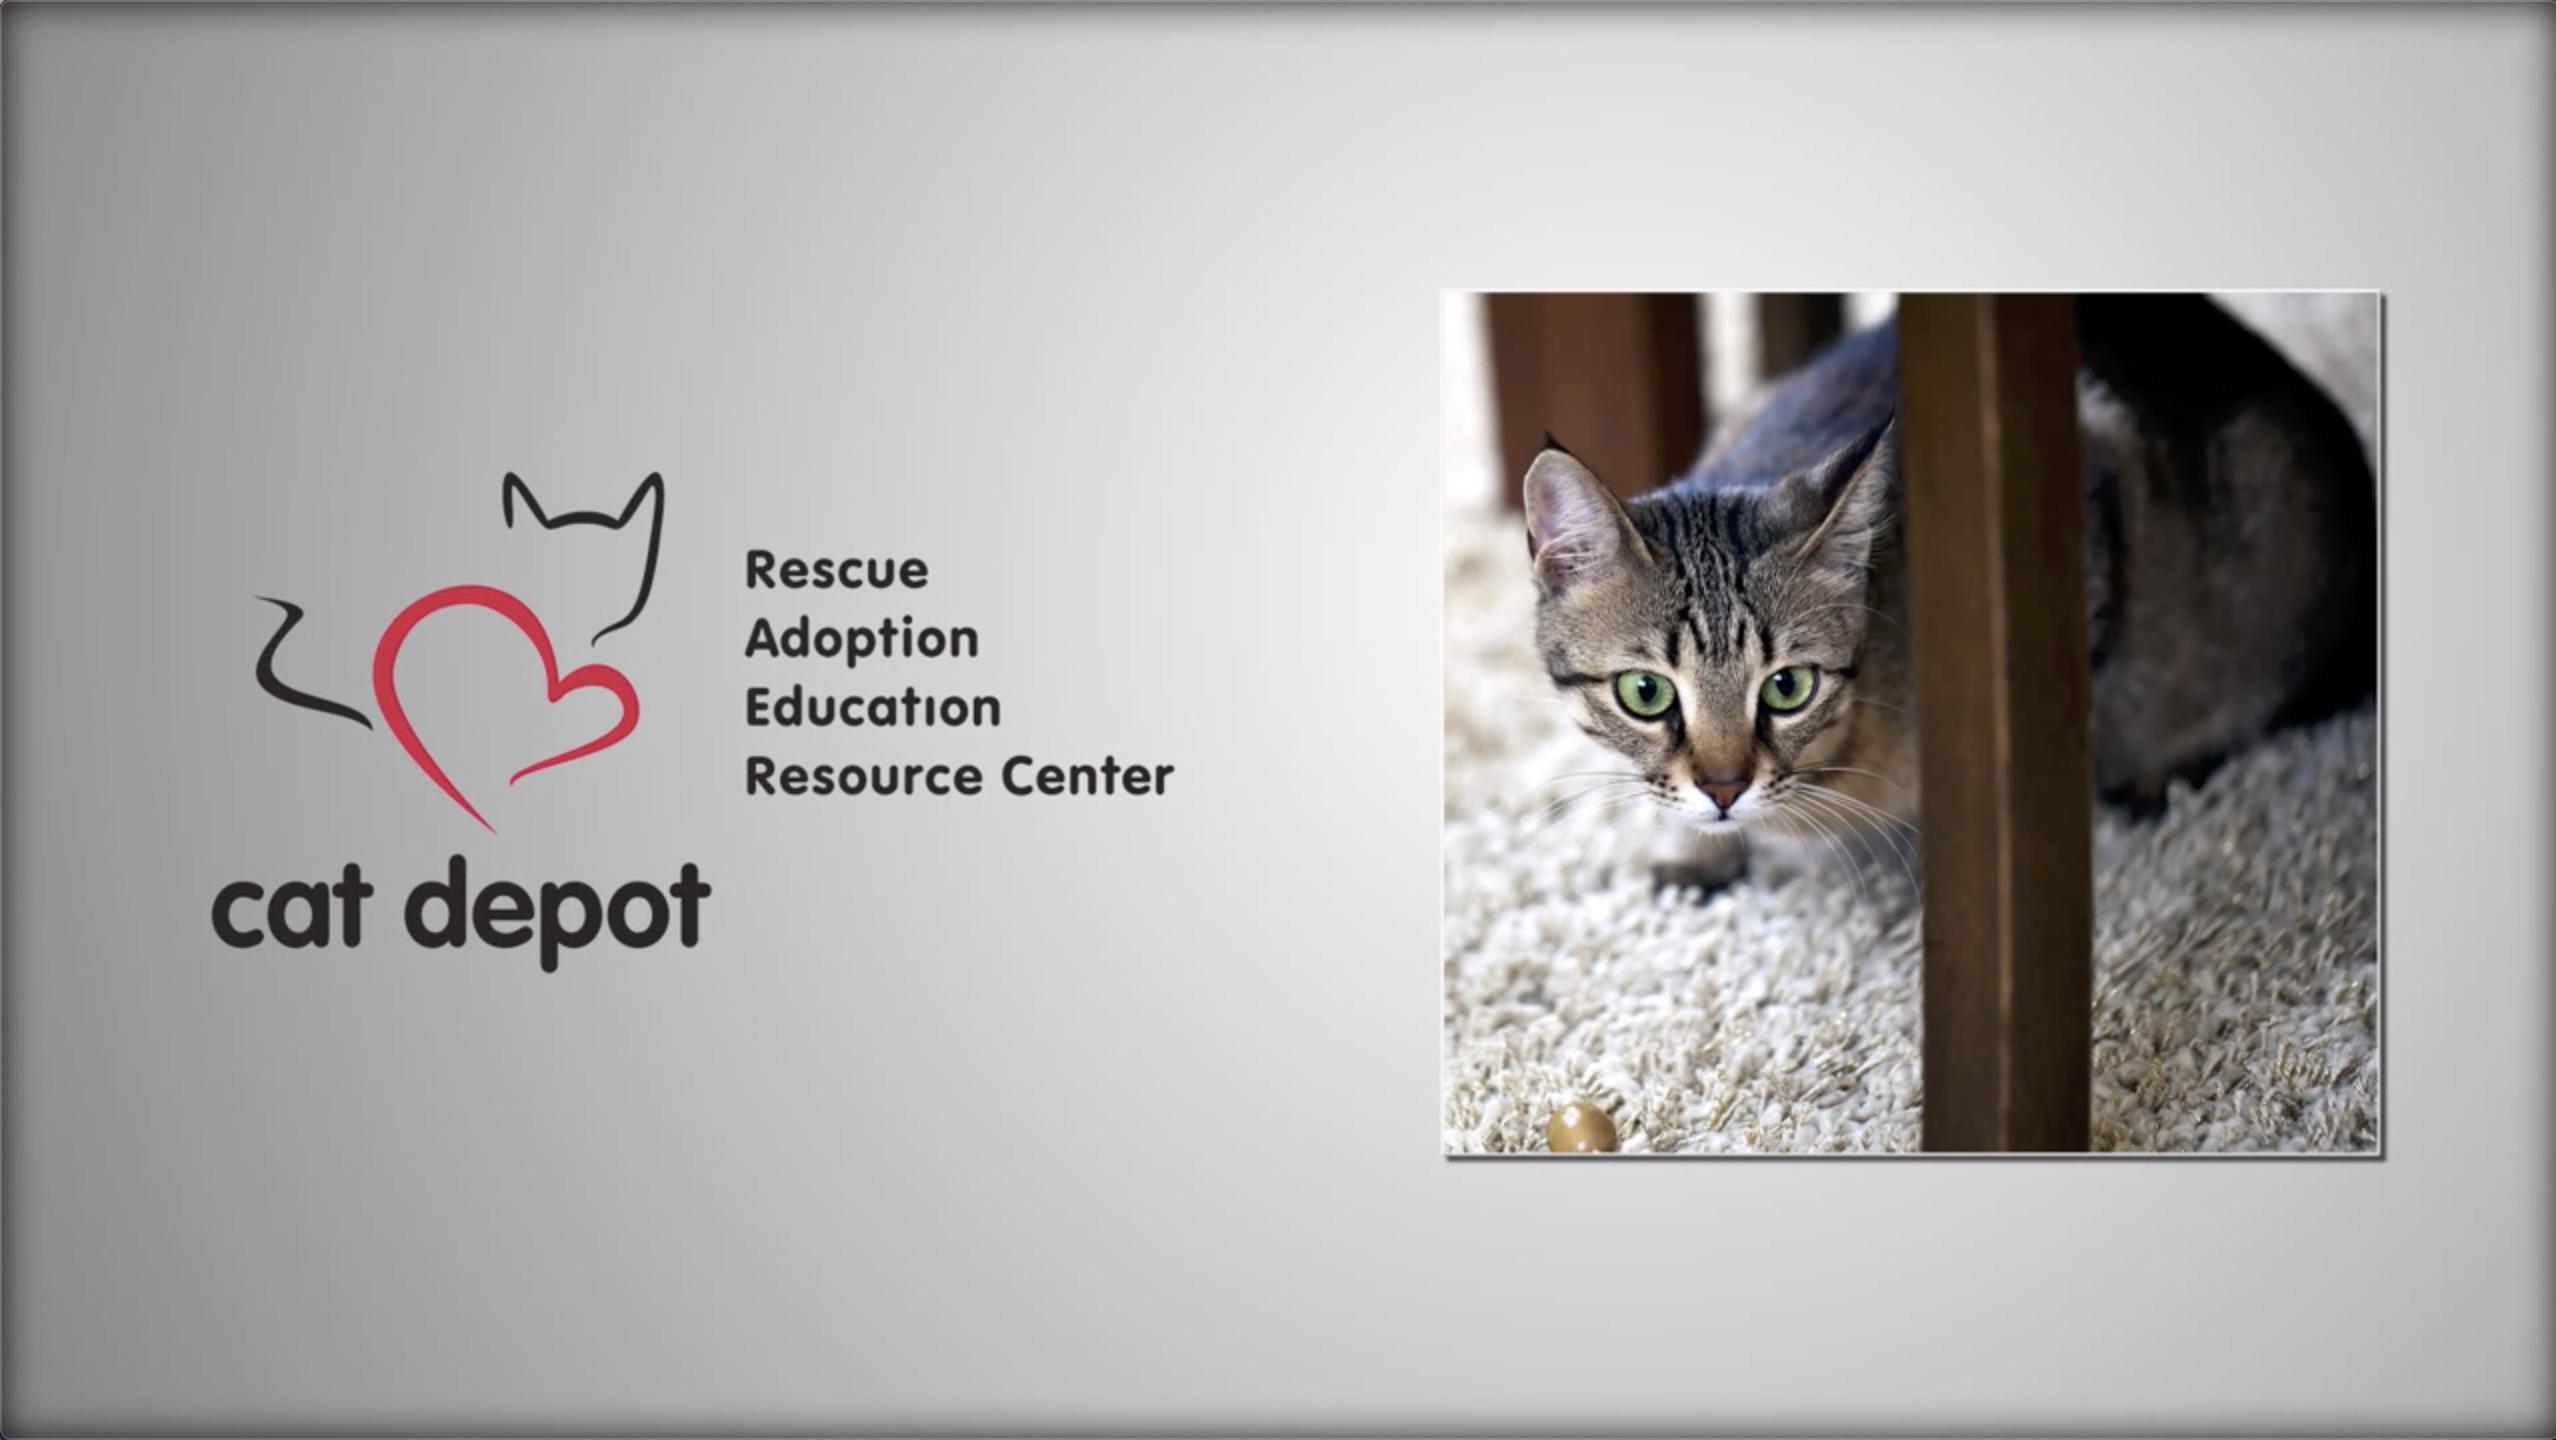 LexJet brandUP Cat Depot